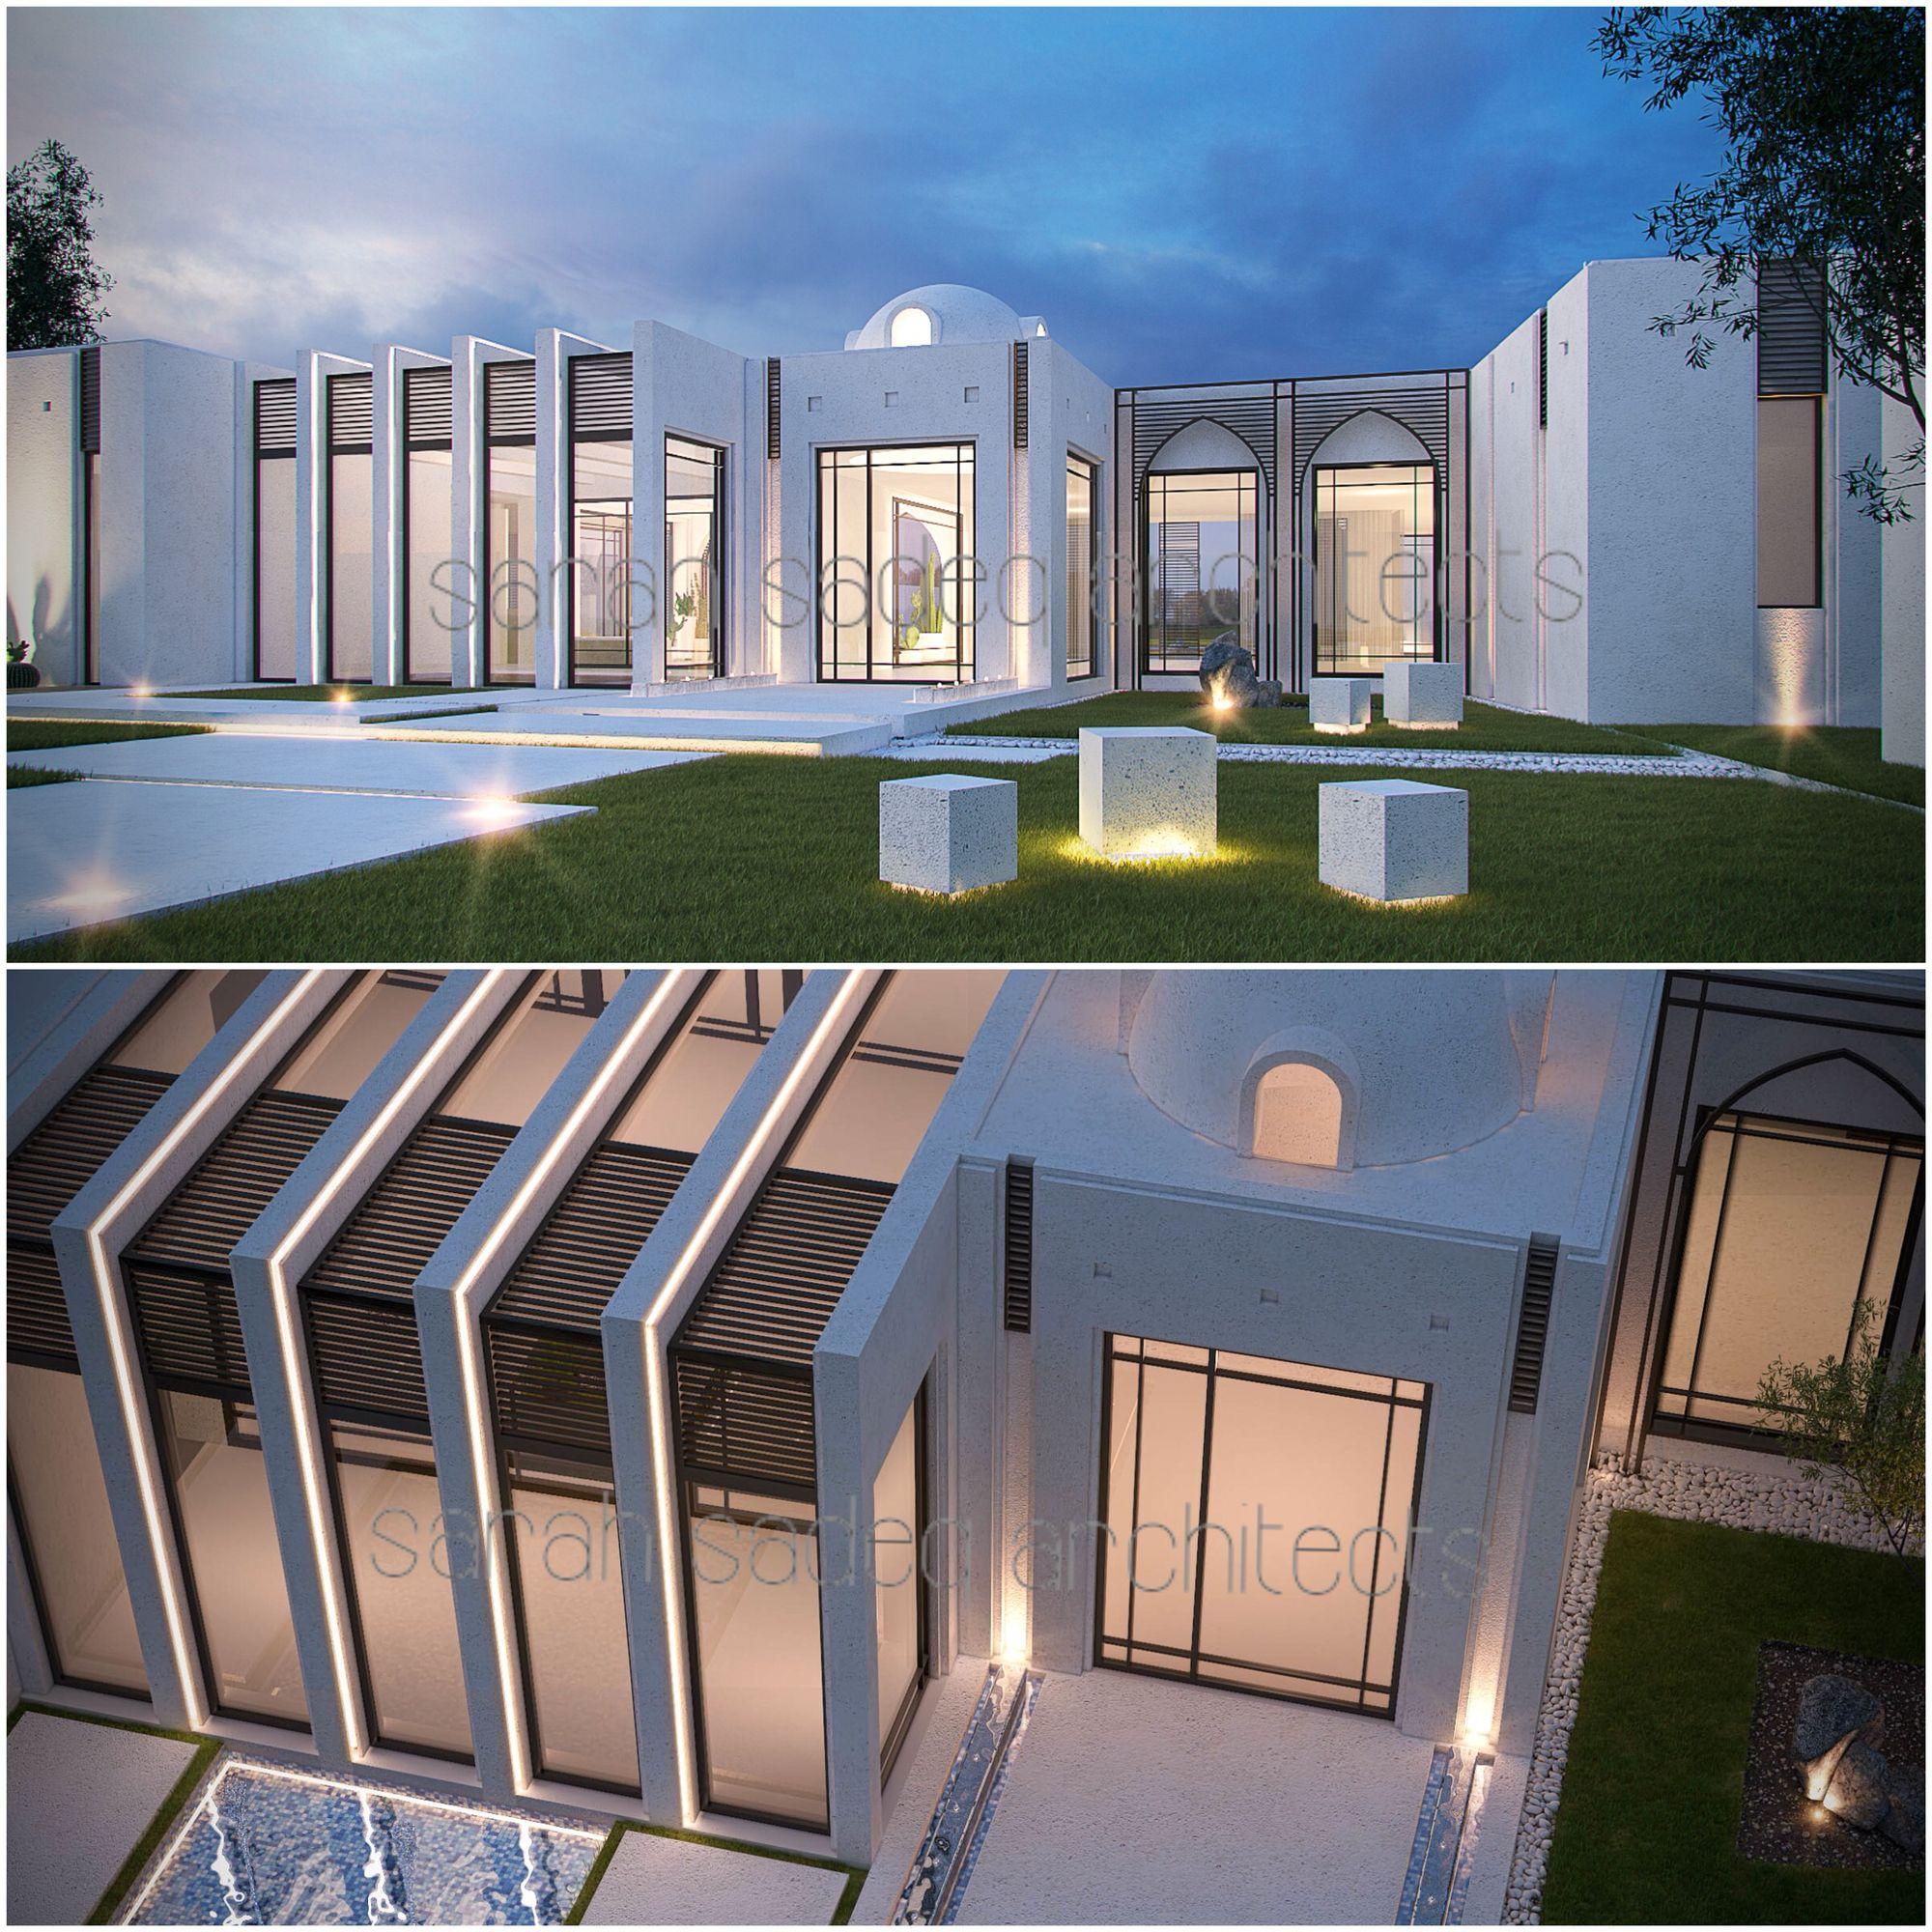 Award winning house at kk nagar chennai designed by ansari architects - Oman Weekend House Sarah Sadeq Architects